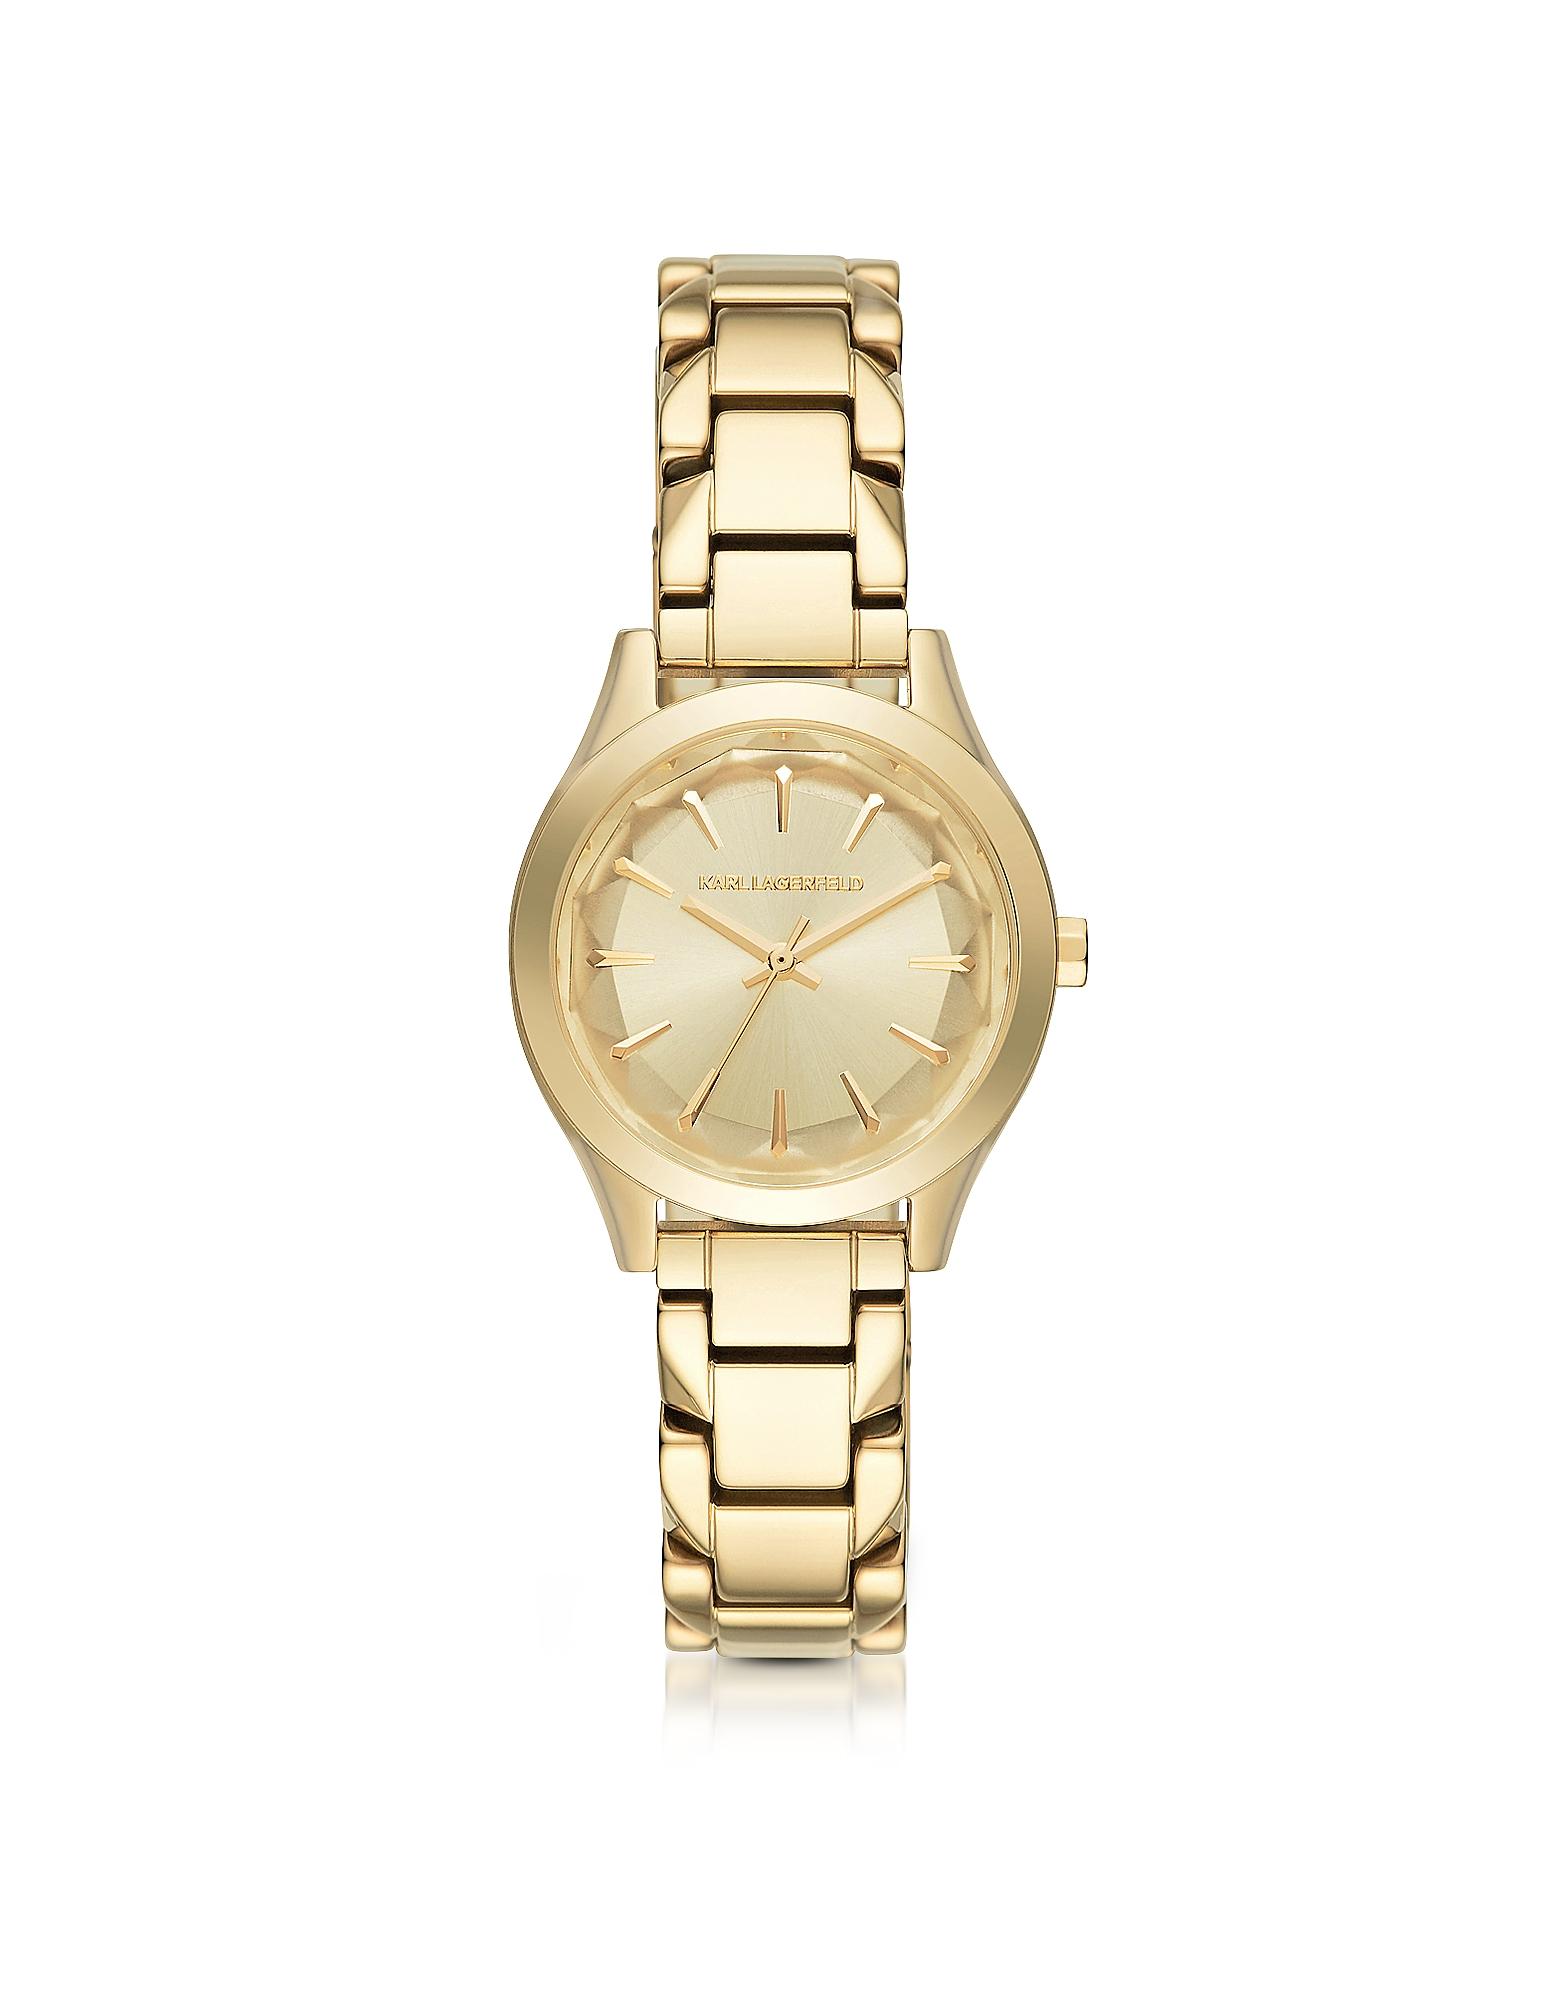 Karl Lagerfeld Women's Watches, Janelle Gold-tone PVD Stainless Steel Women's Quartz Watch